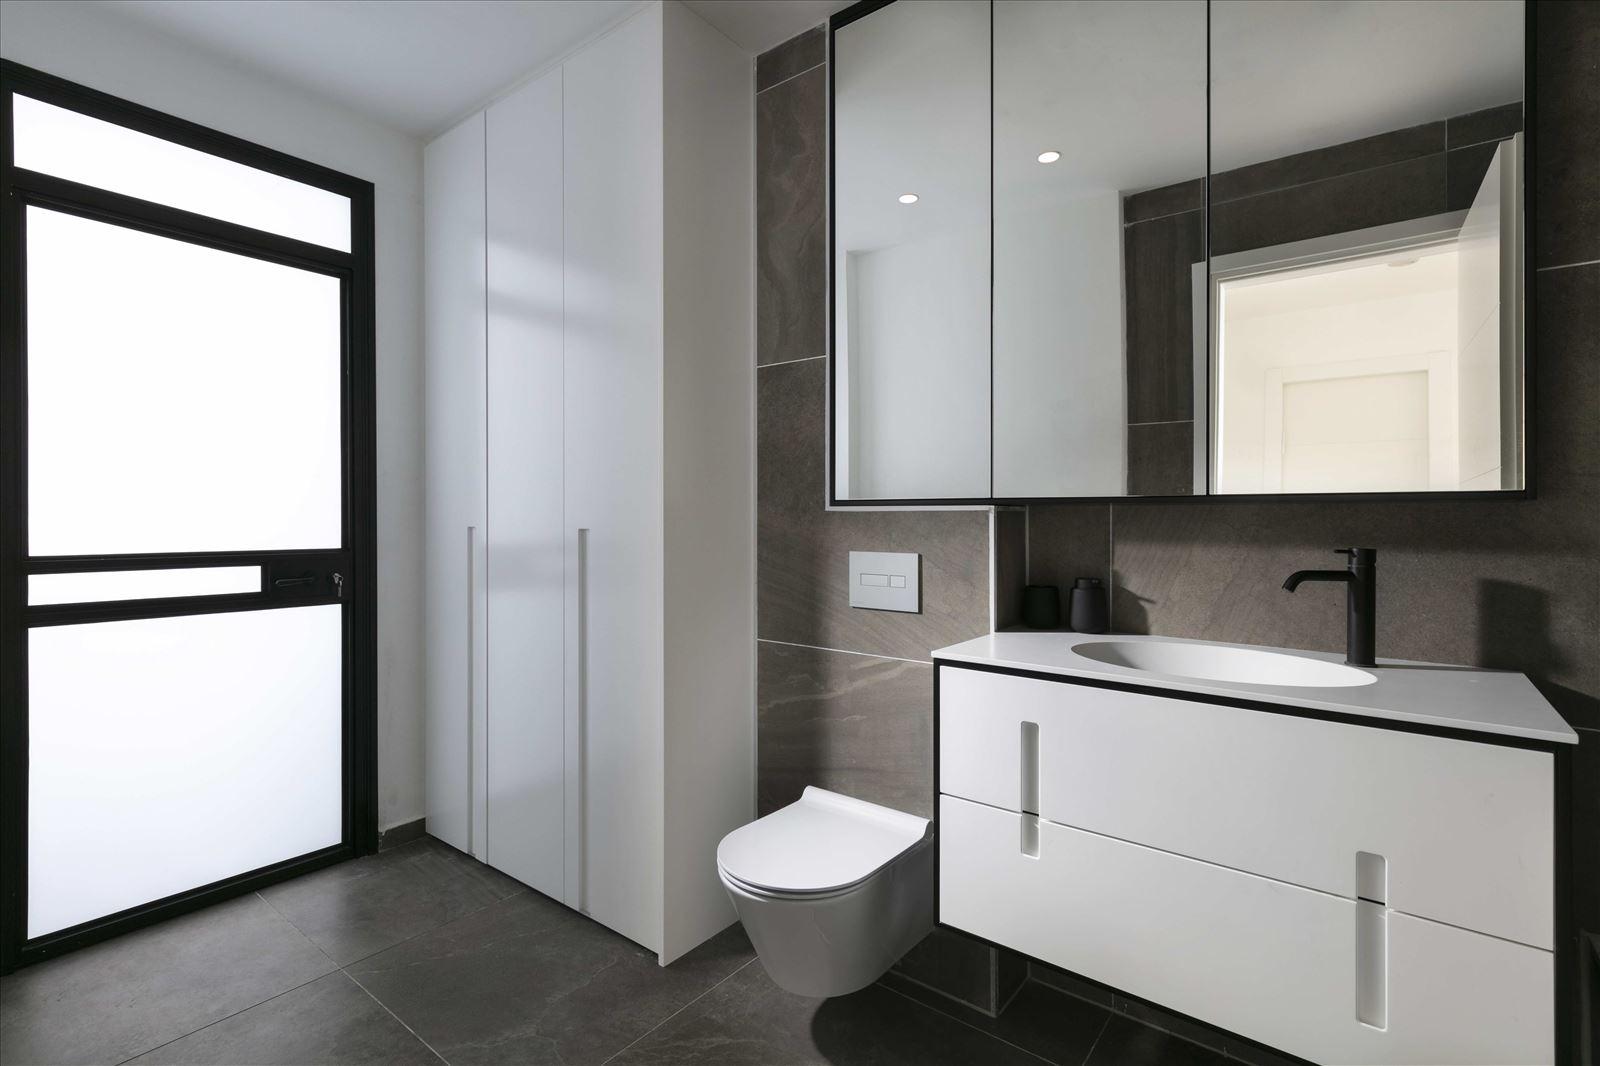 Private home - Herzliya תאורה בשירותים נעשתה על ידי דורי קמחי